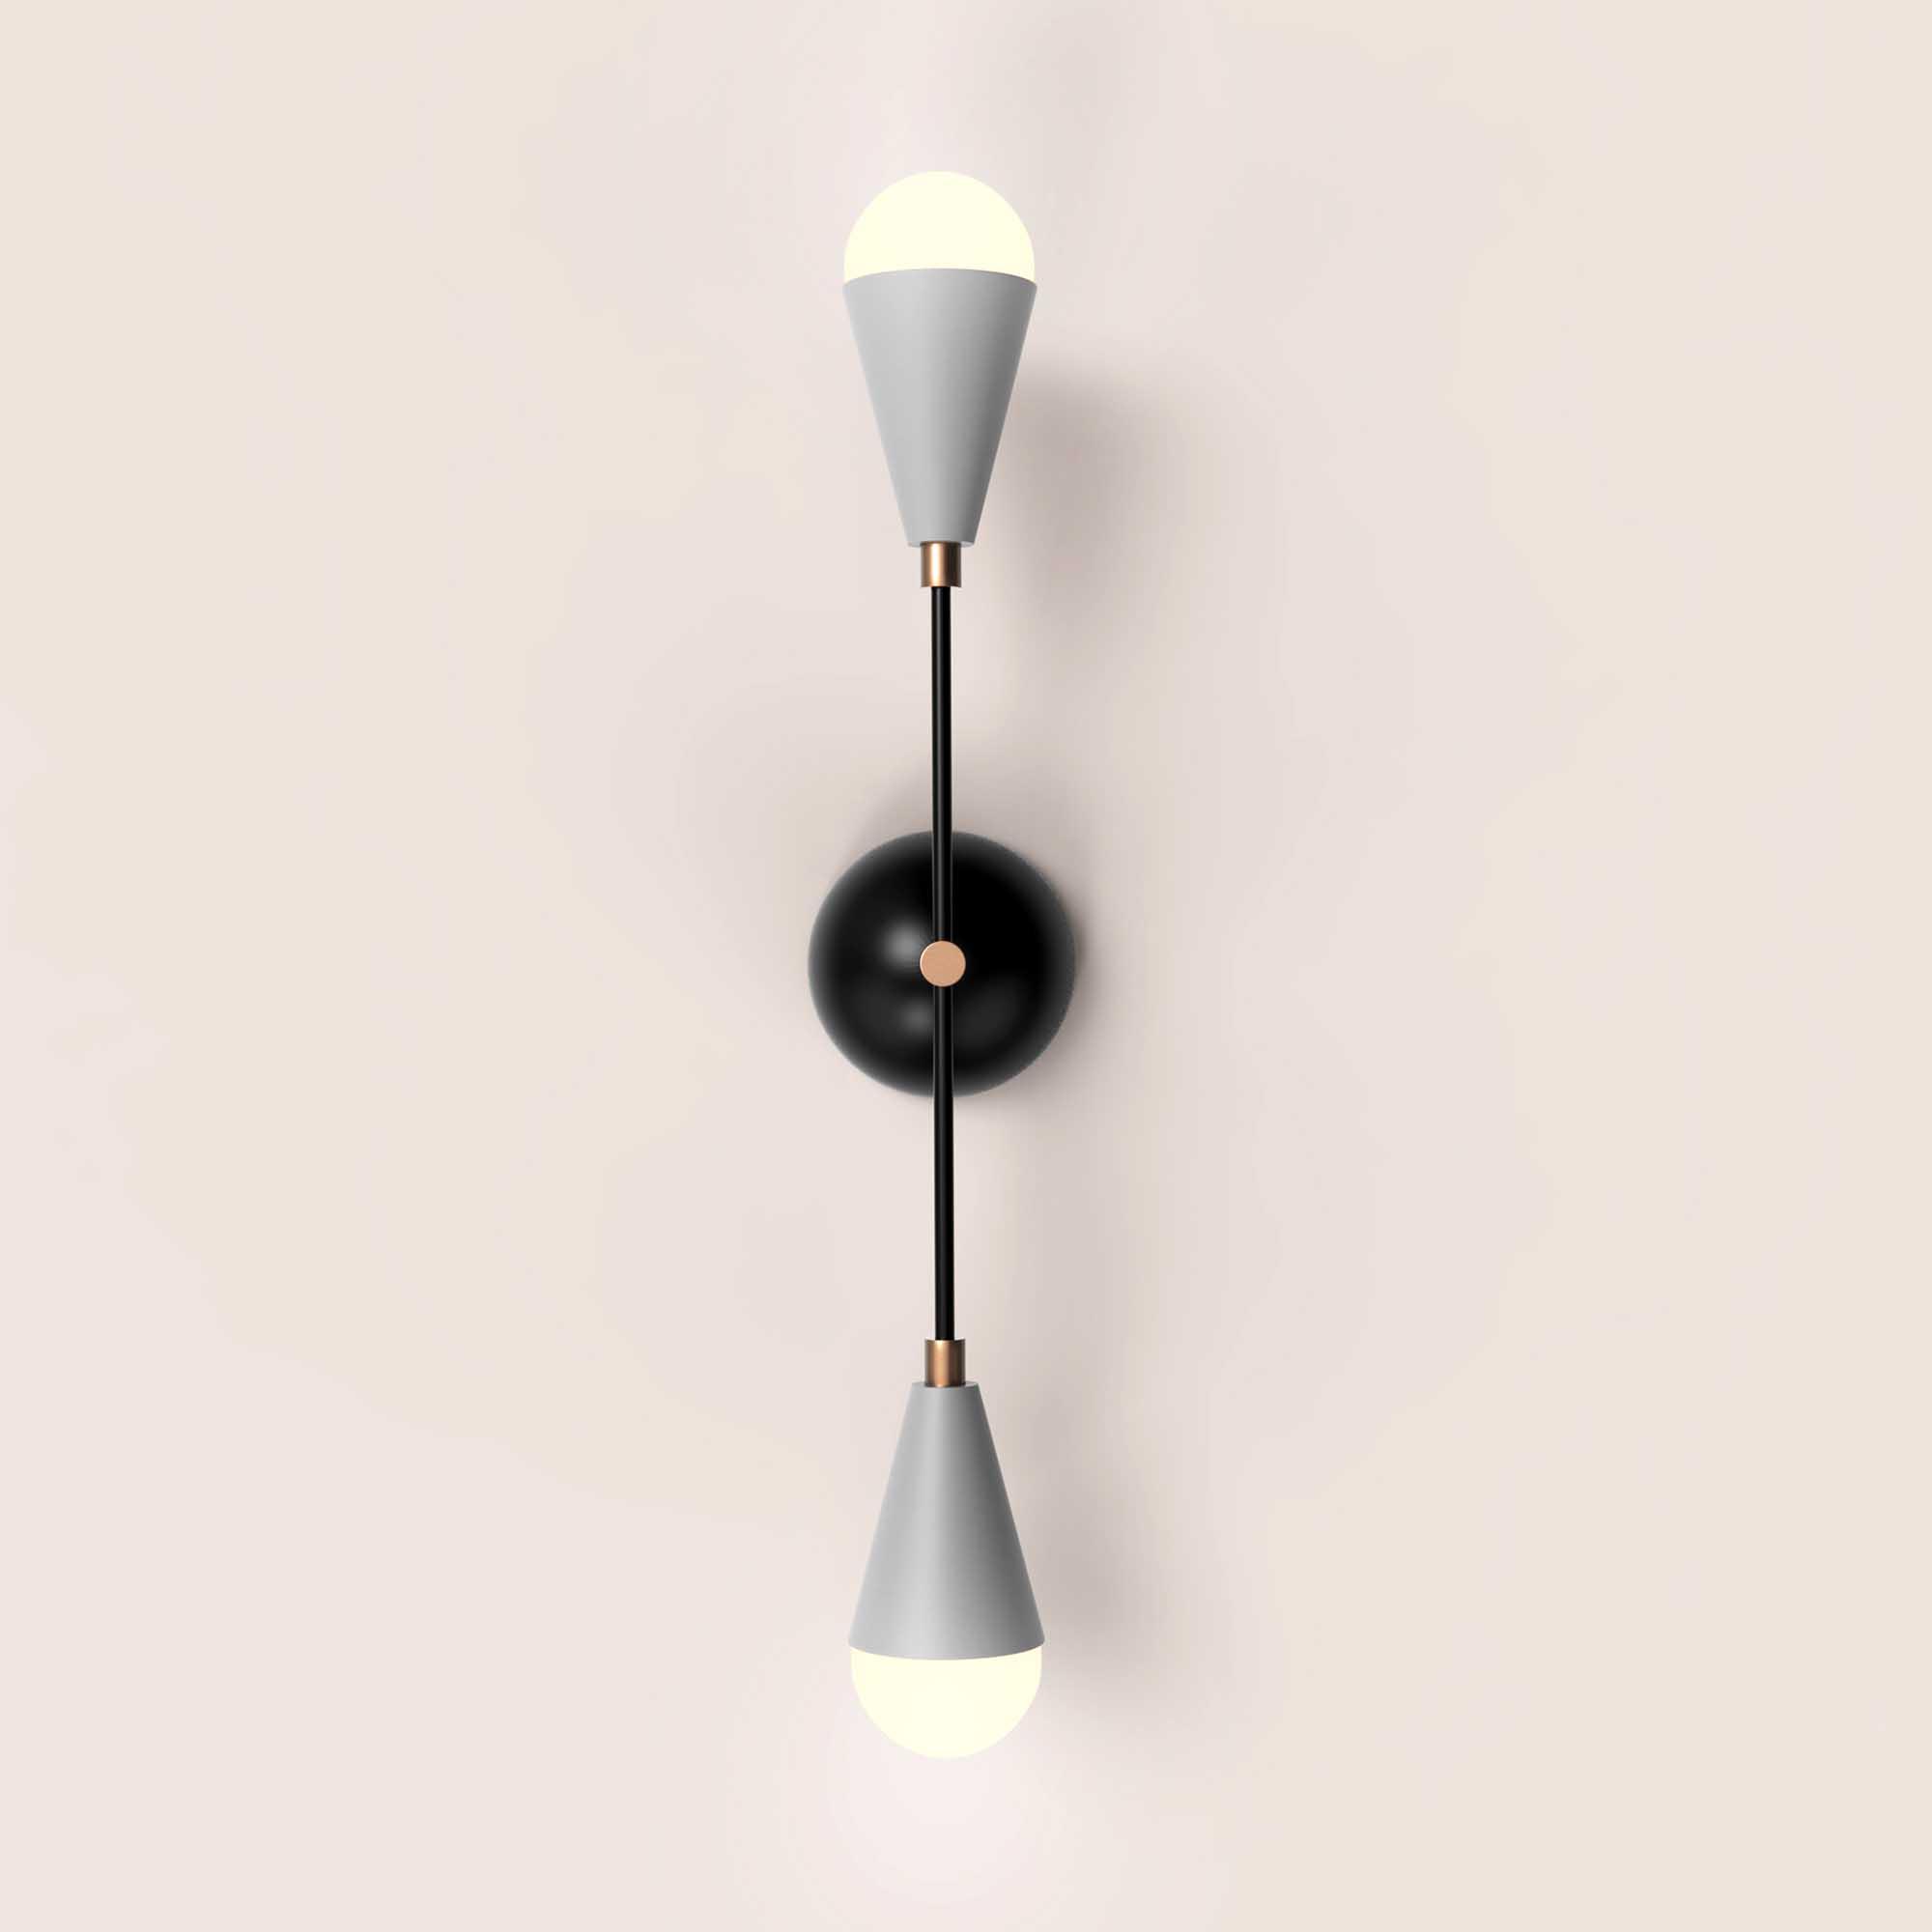 Minimalist Elegant Silver and Black Wall Lamp  - 3D Model